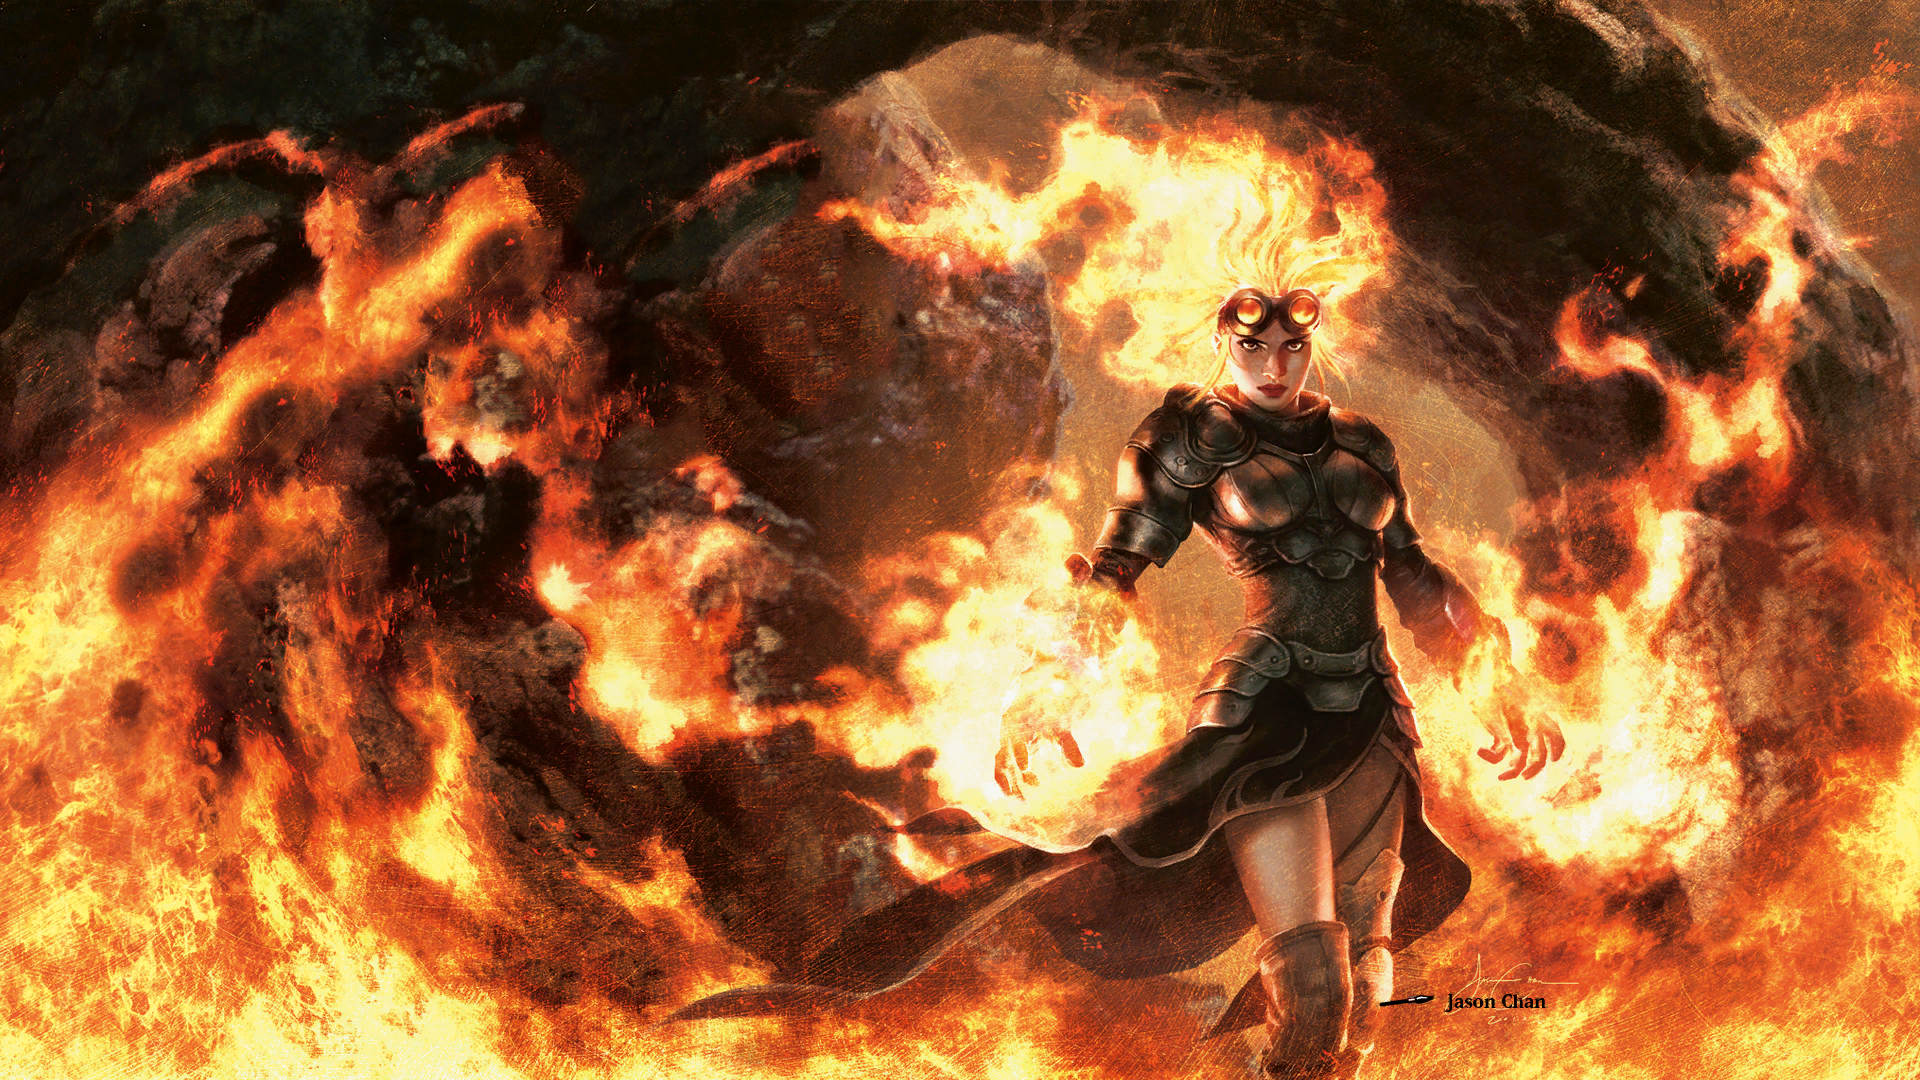 528490-armor-chandra-nalaar-fantasy-fire-flames-glasses-goggles-jason-chan-m12-mage-magic-magician-magic-the-gathering-mtg-orange-planeswalker-sorcerer-sorceress-dragon39s-crown-women.jpg (1920×1080)